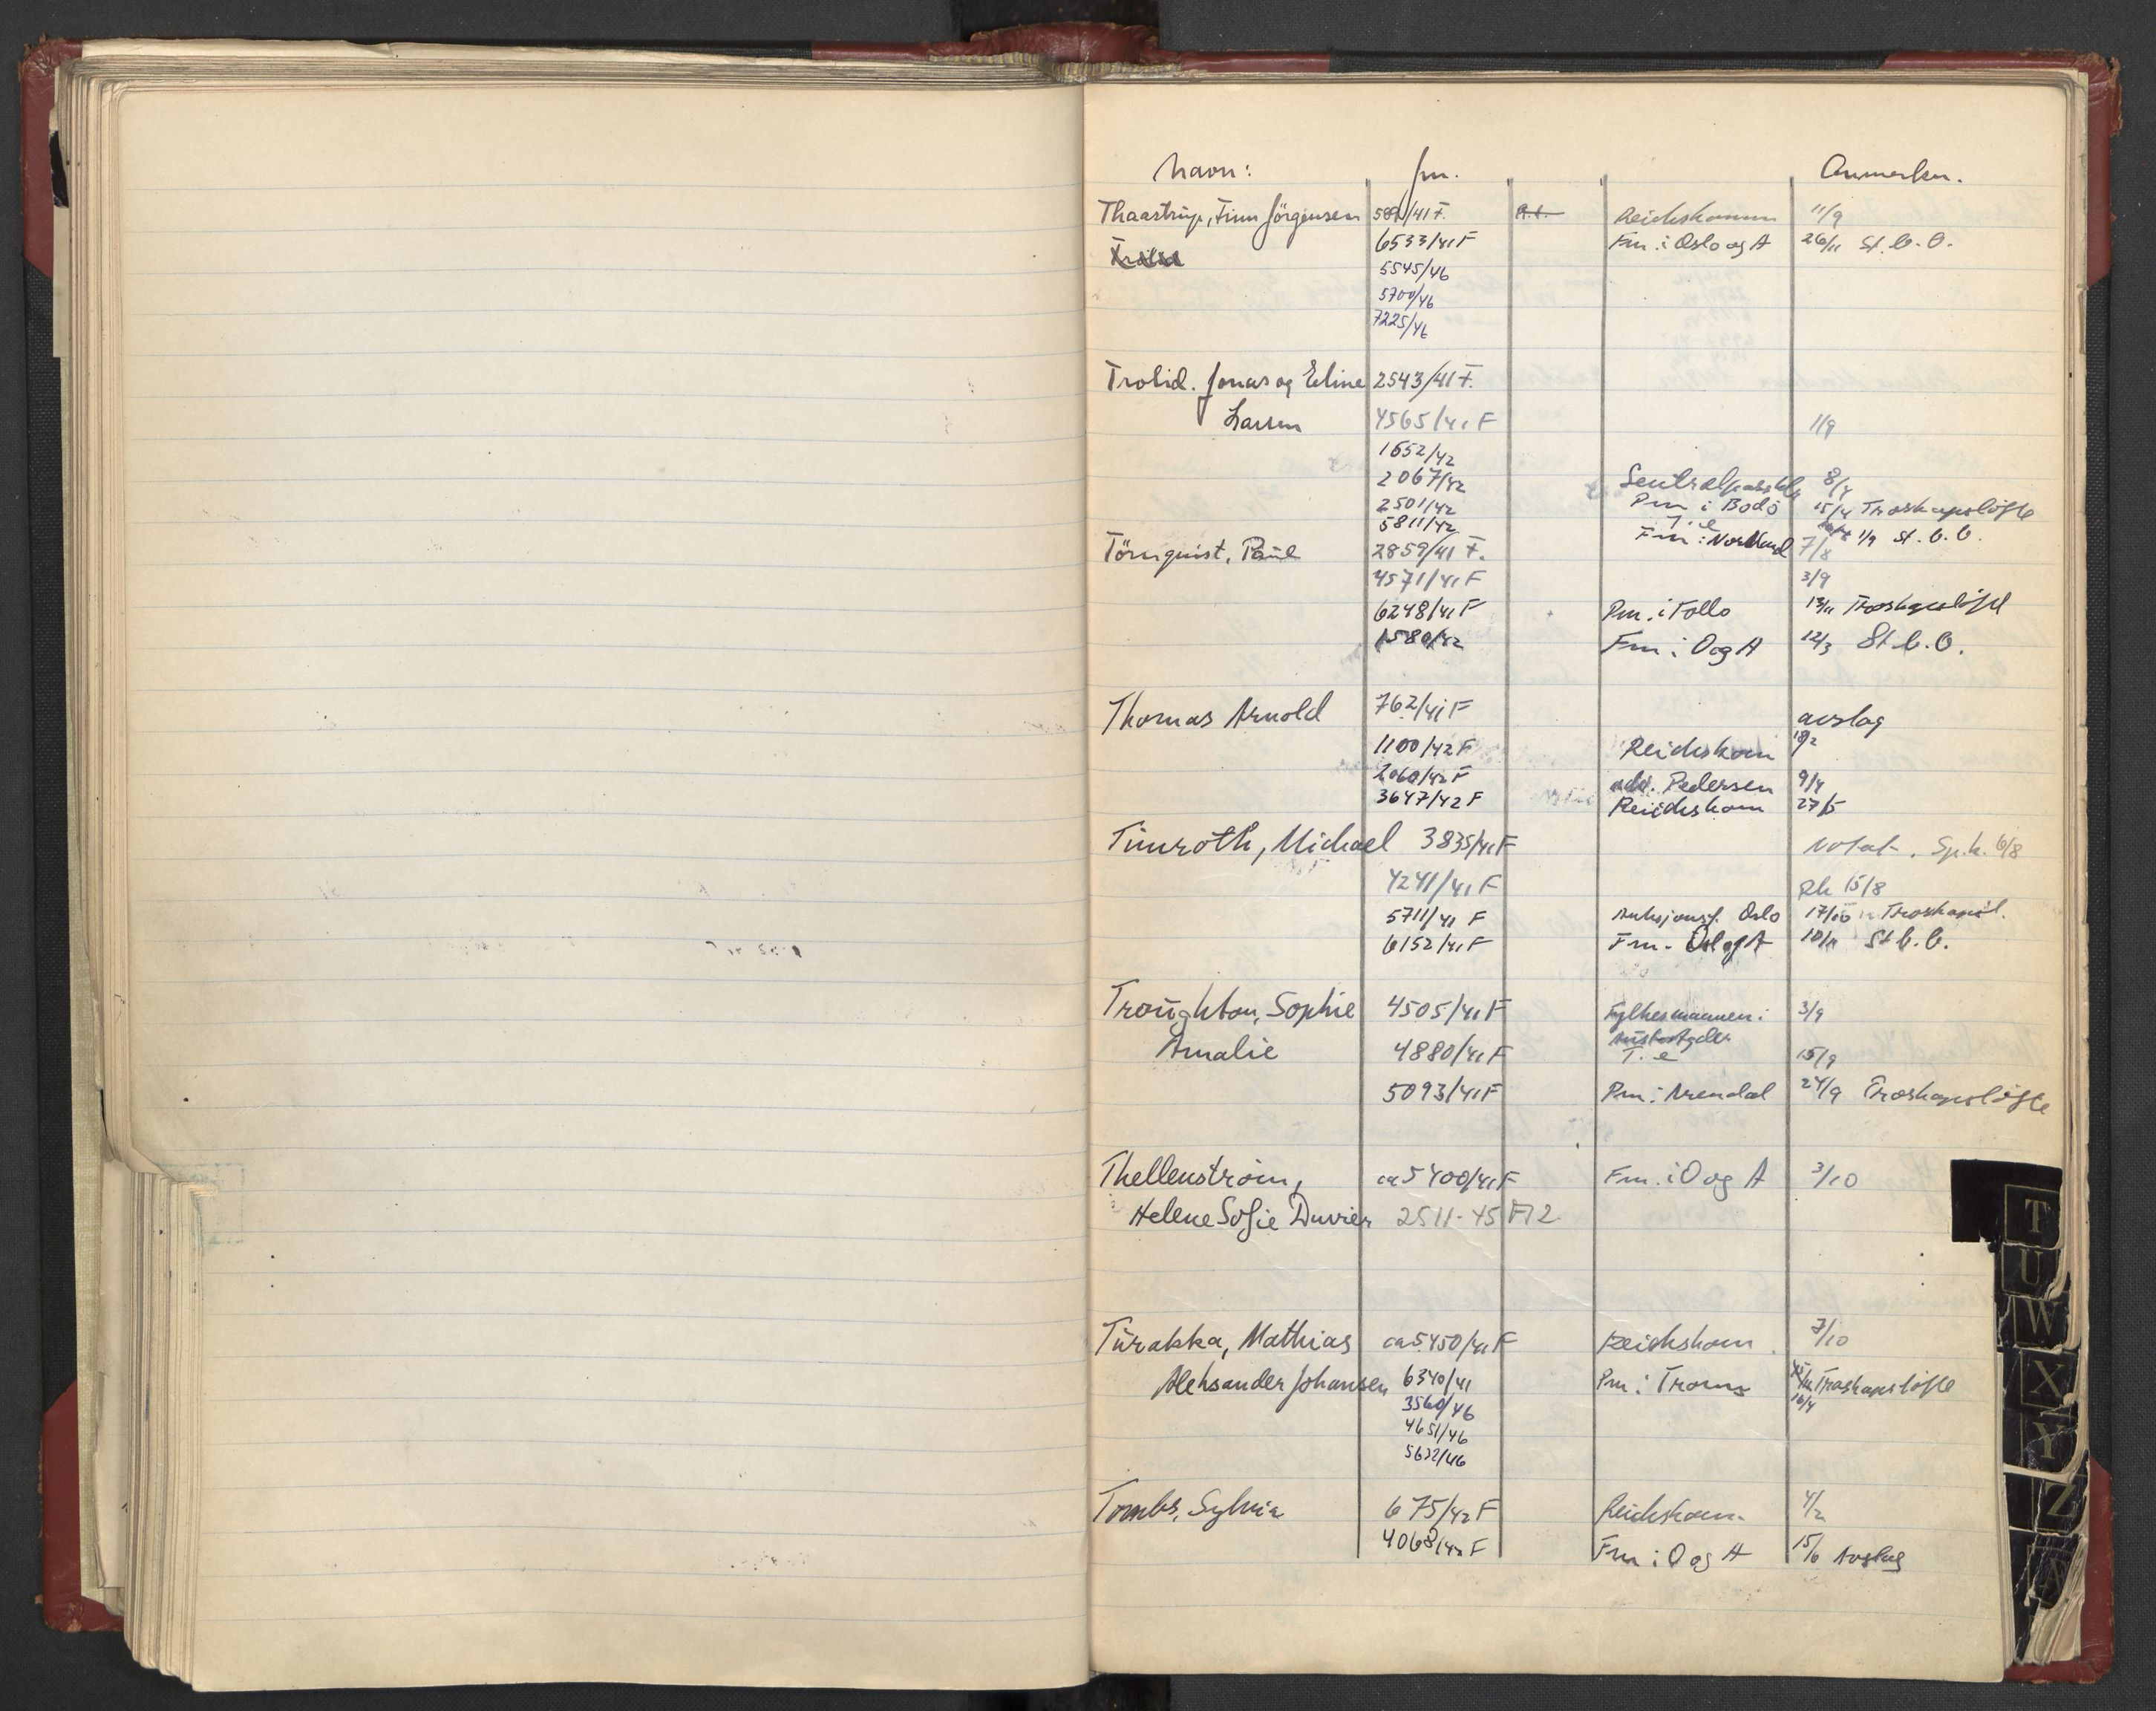 RA, Justisdepartementet, 3. politikontor P3, C/Cc/L0002: Journalregister over statsborgersaker, 1940-1946, s. 101